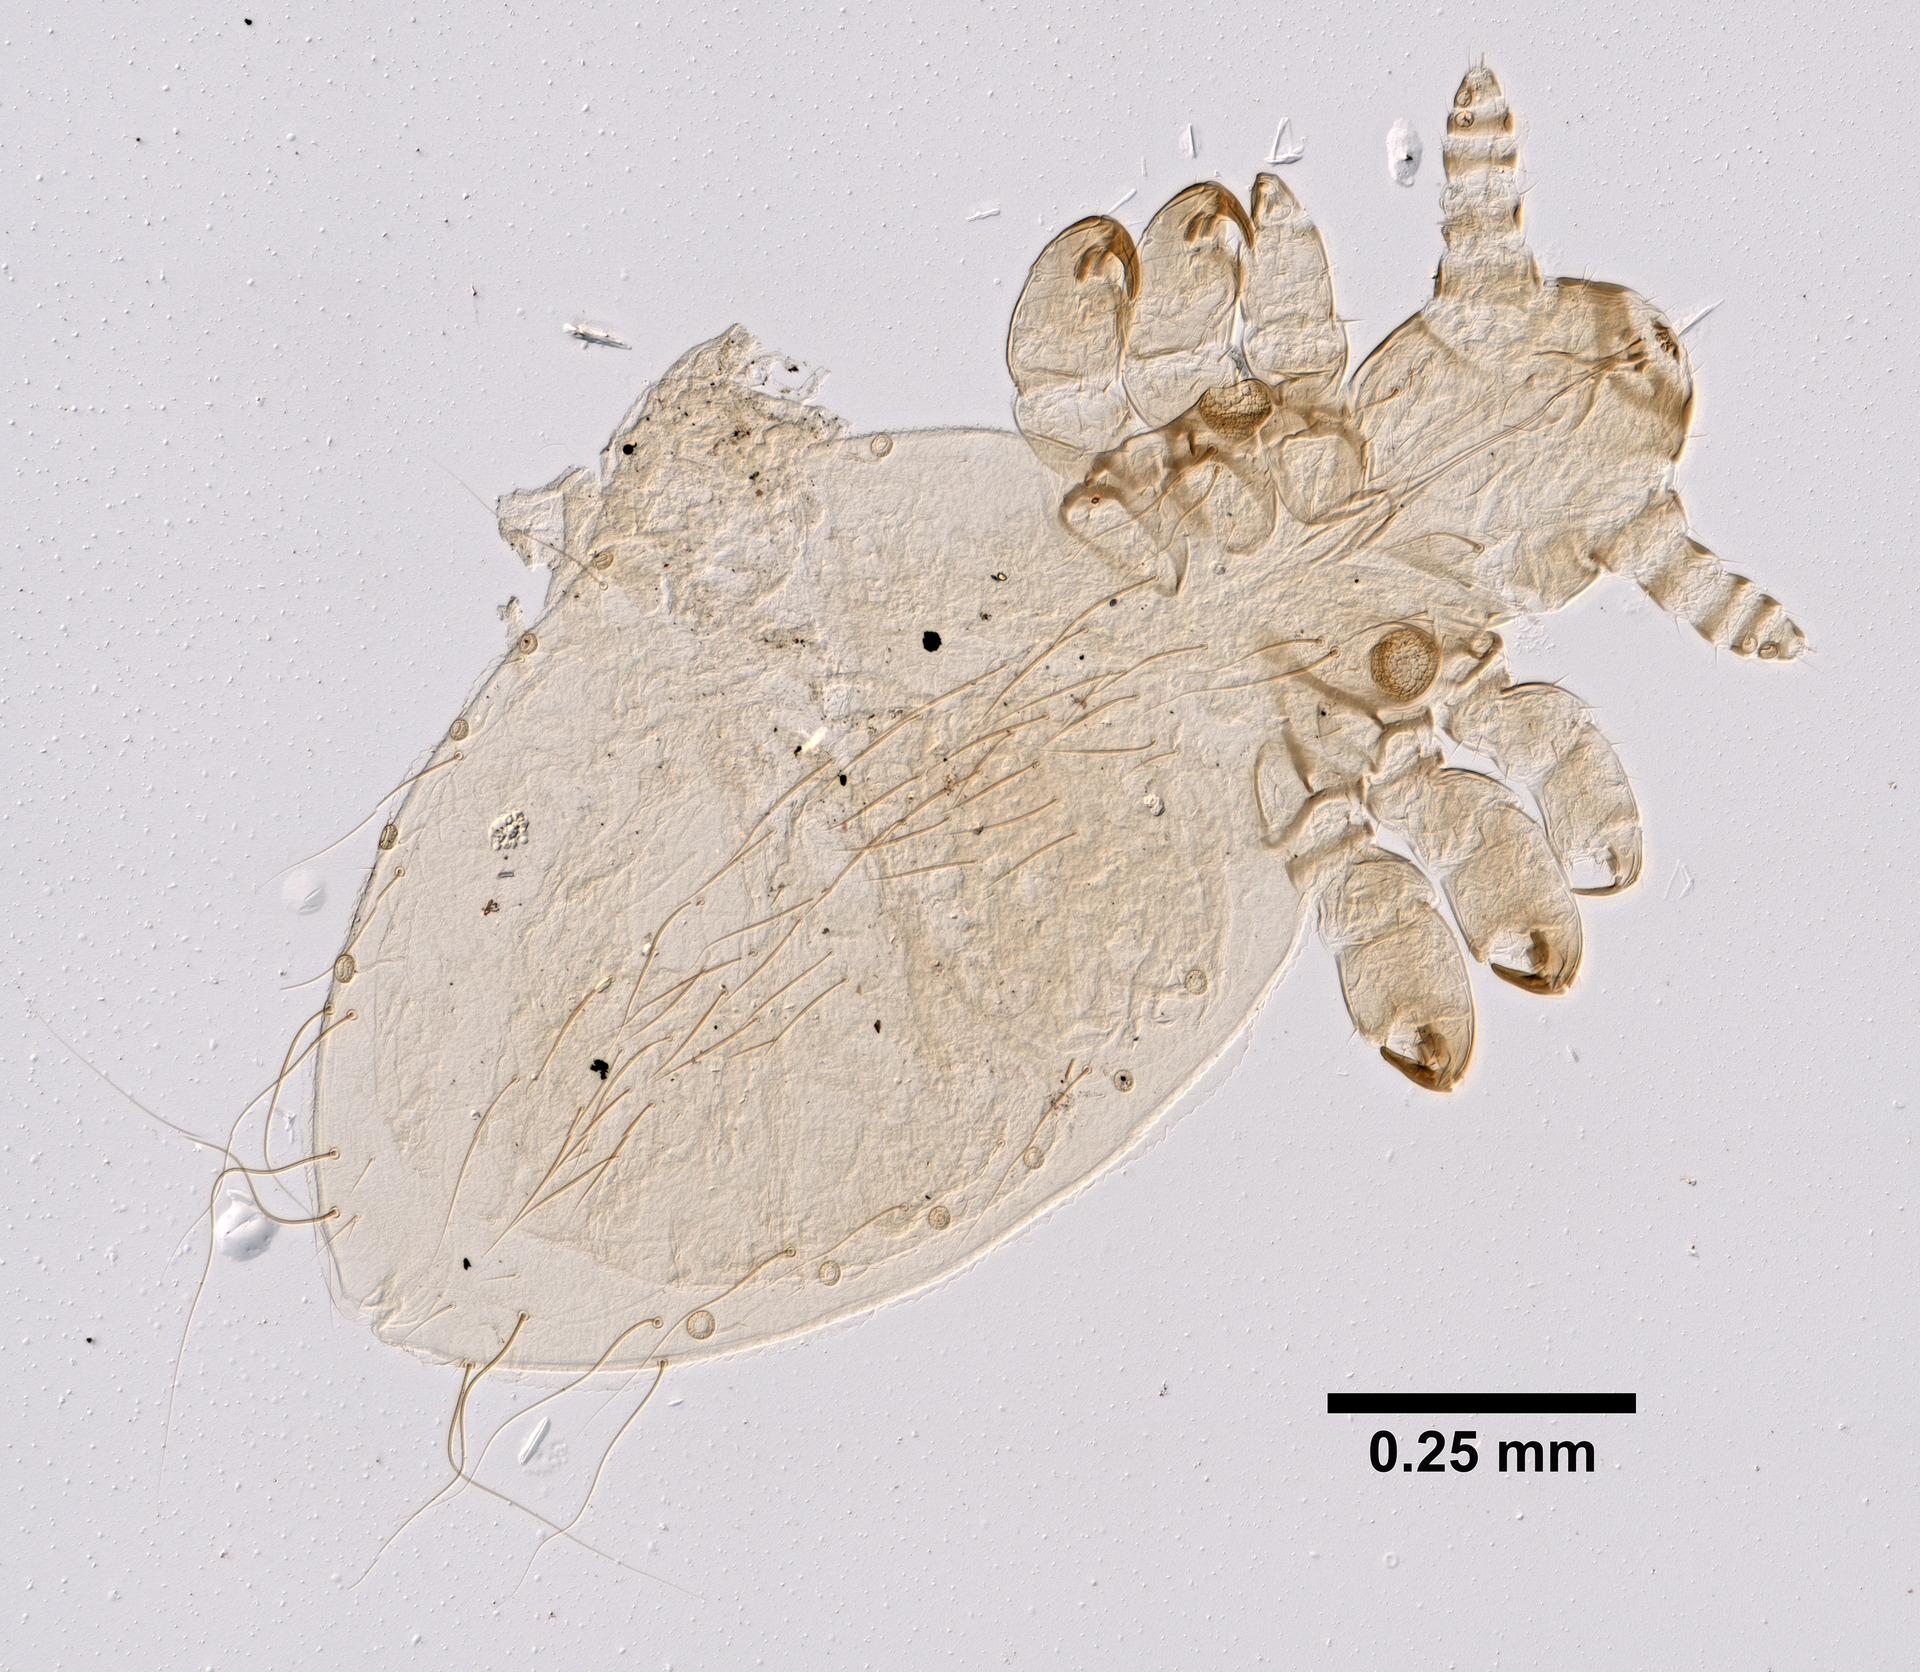 "<a title=""Yale Peabody Museum of Natural History  [CC0], via Wikimedia Commons"" href=""https://commons.wikimedia.org/wiki/File:Linognathus_setosus_(YPM_IZ_099333).jpeg""><img loading="